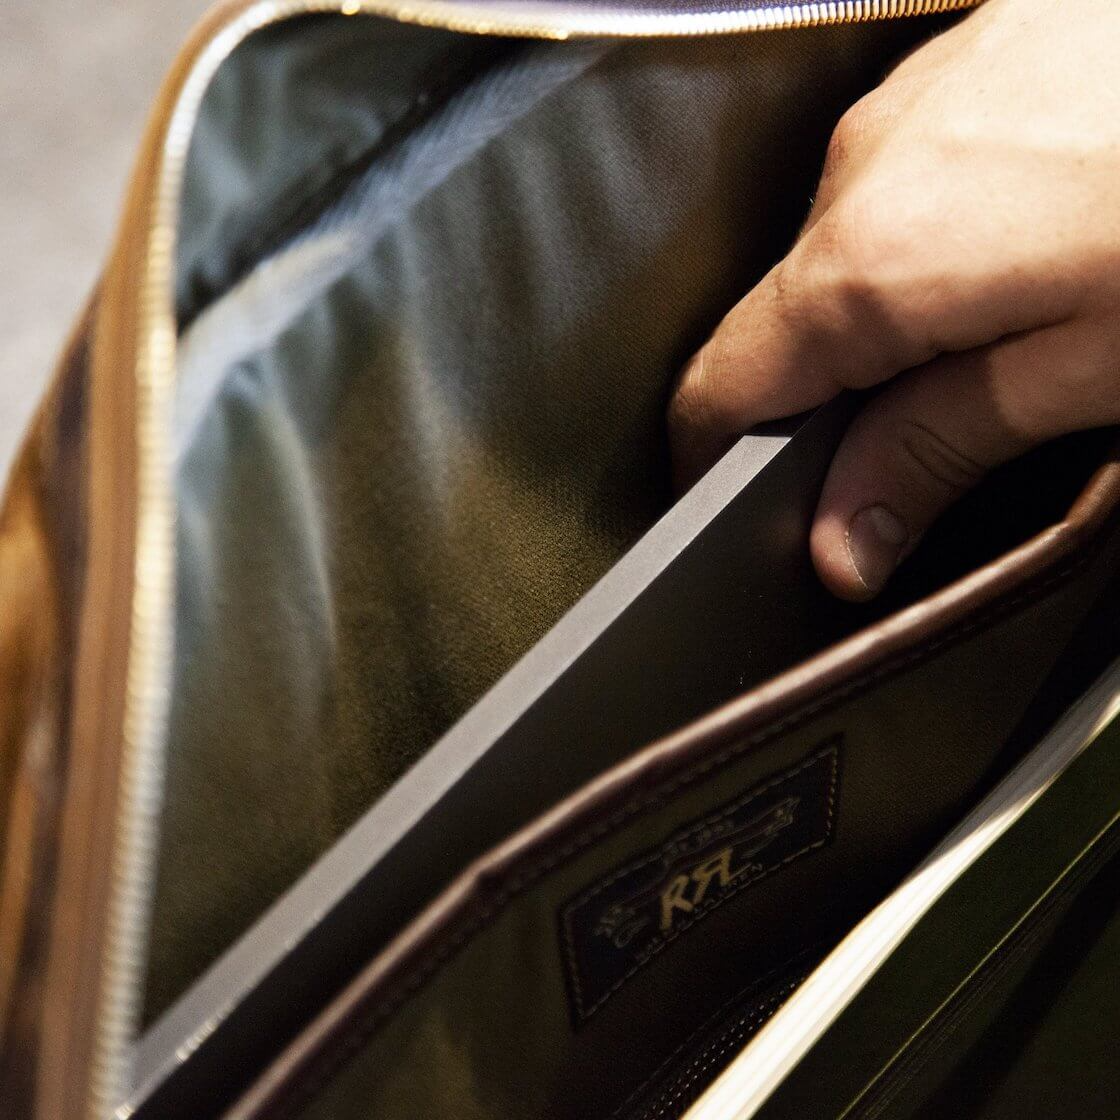 rrl briefcase